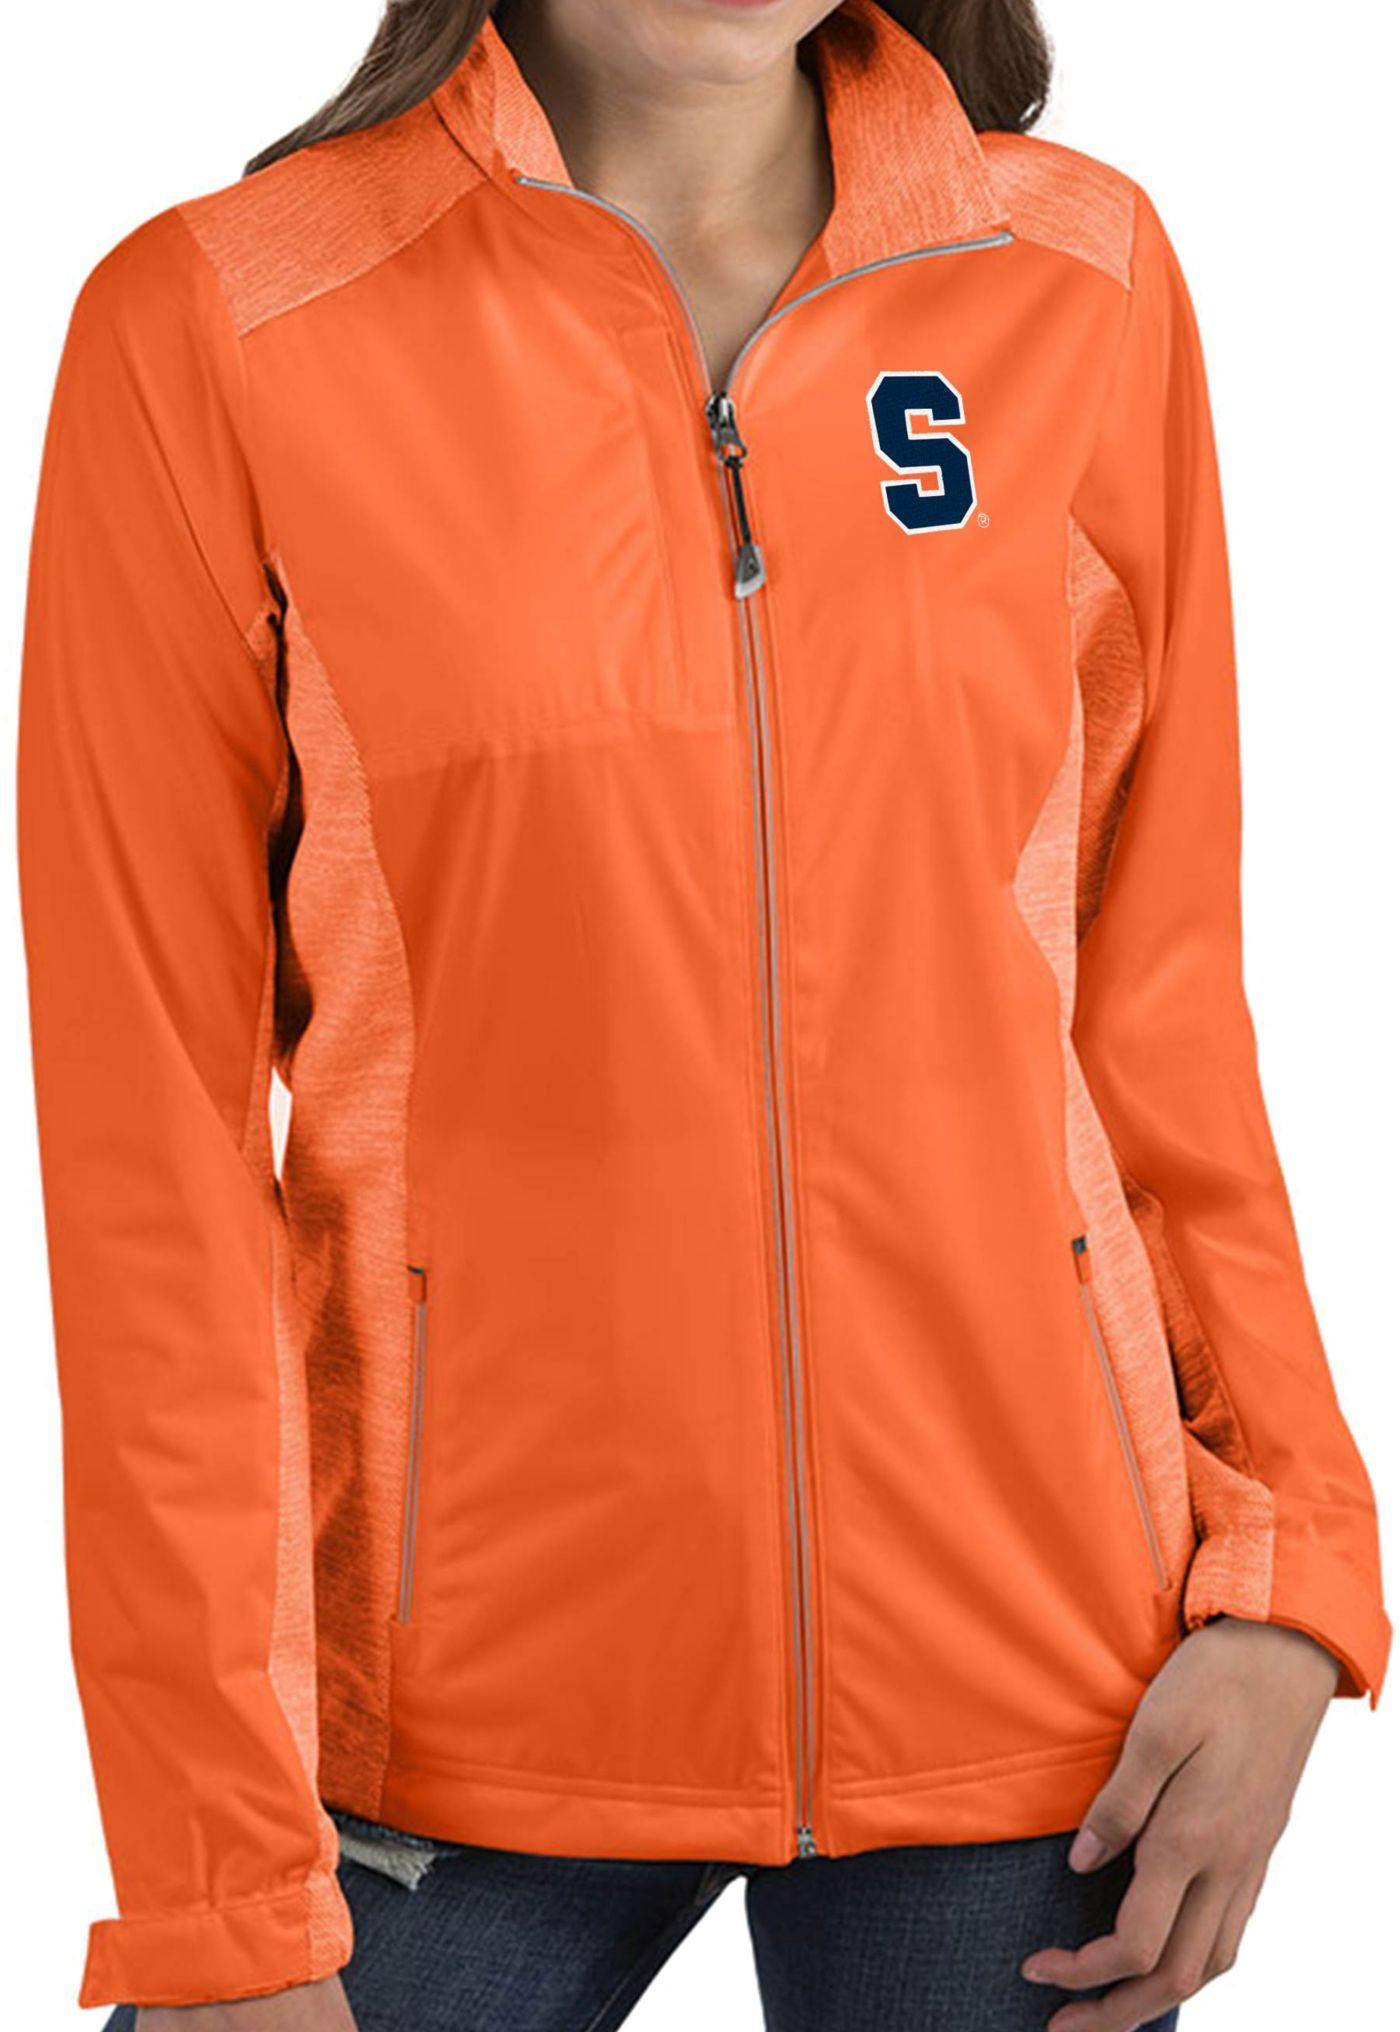 Antigua Women's Syracuse Orange Orange Revolve Full-Zip Jacket